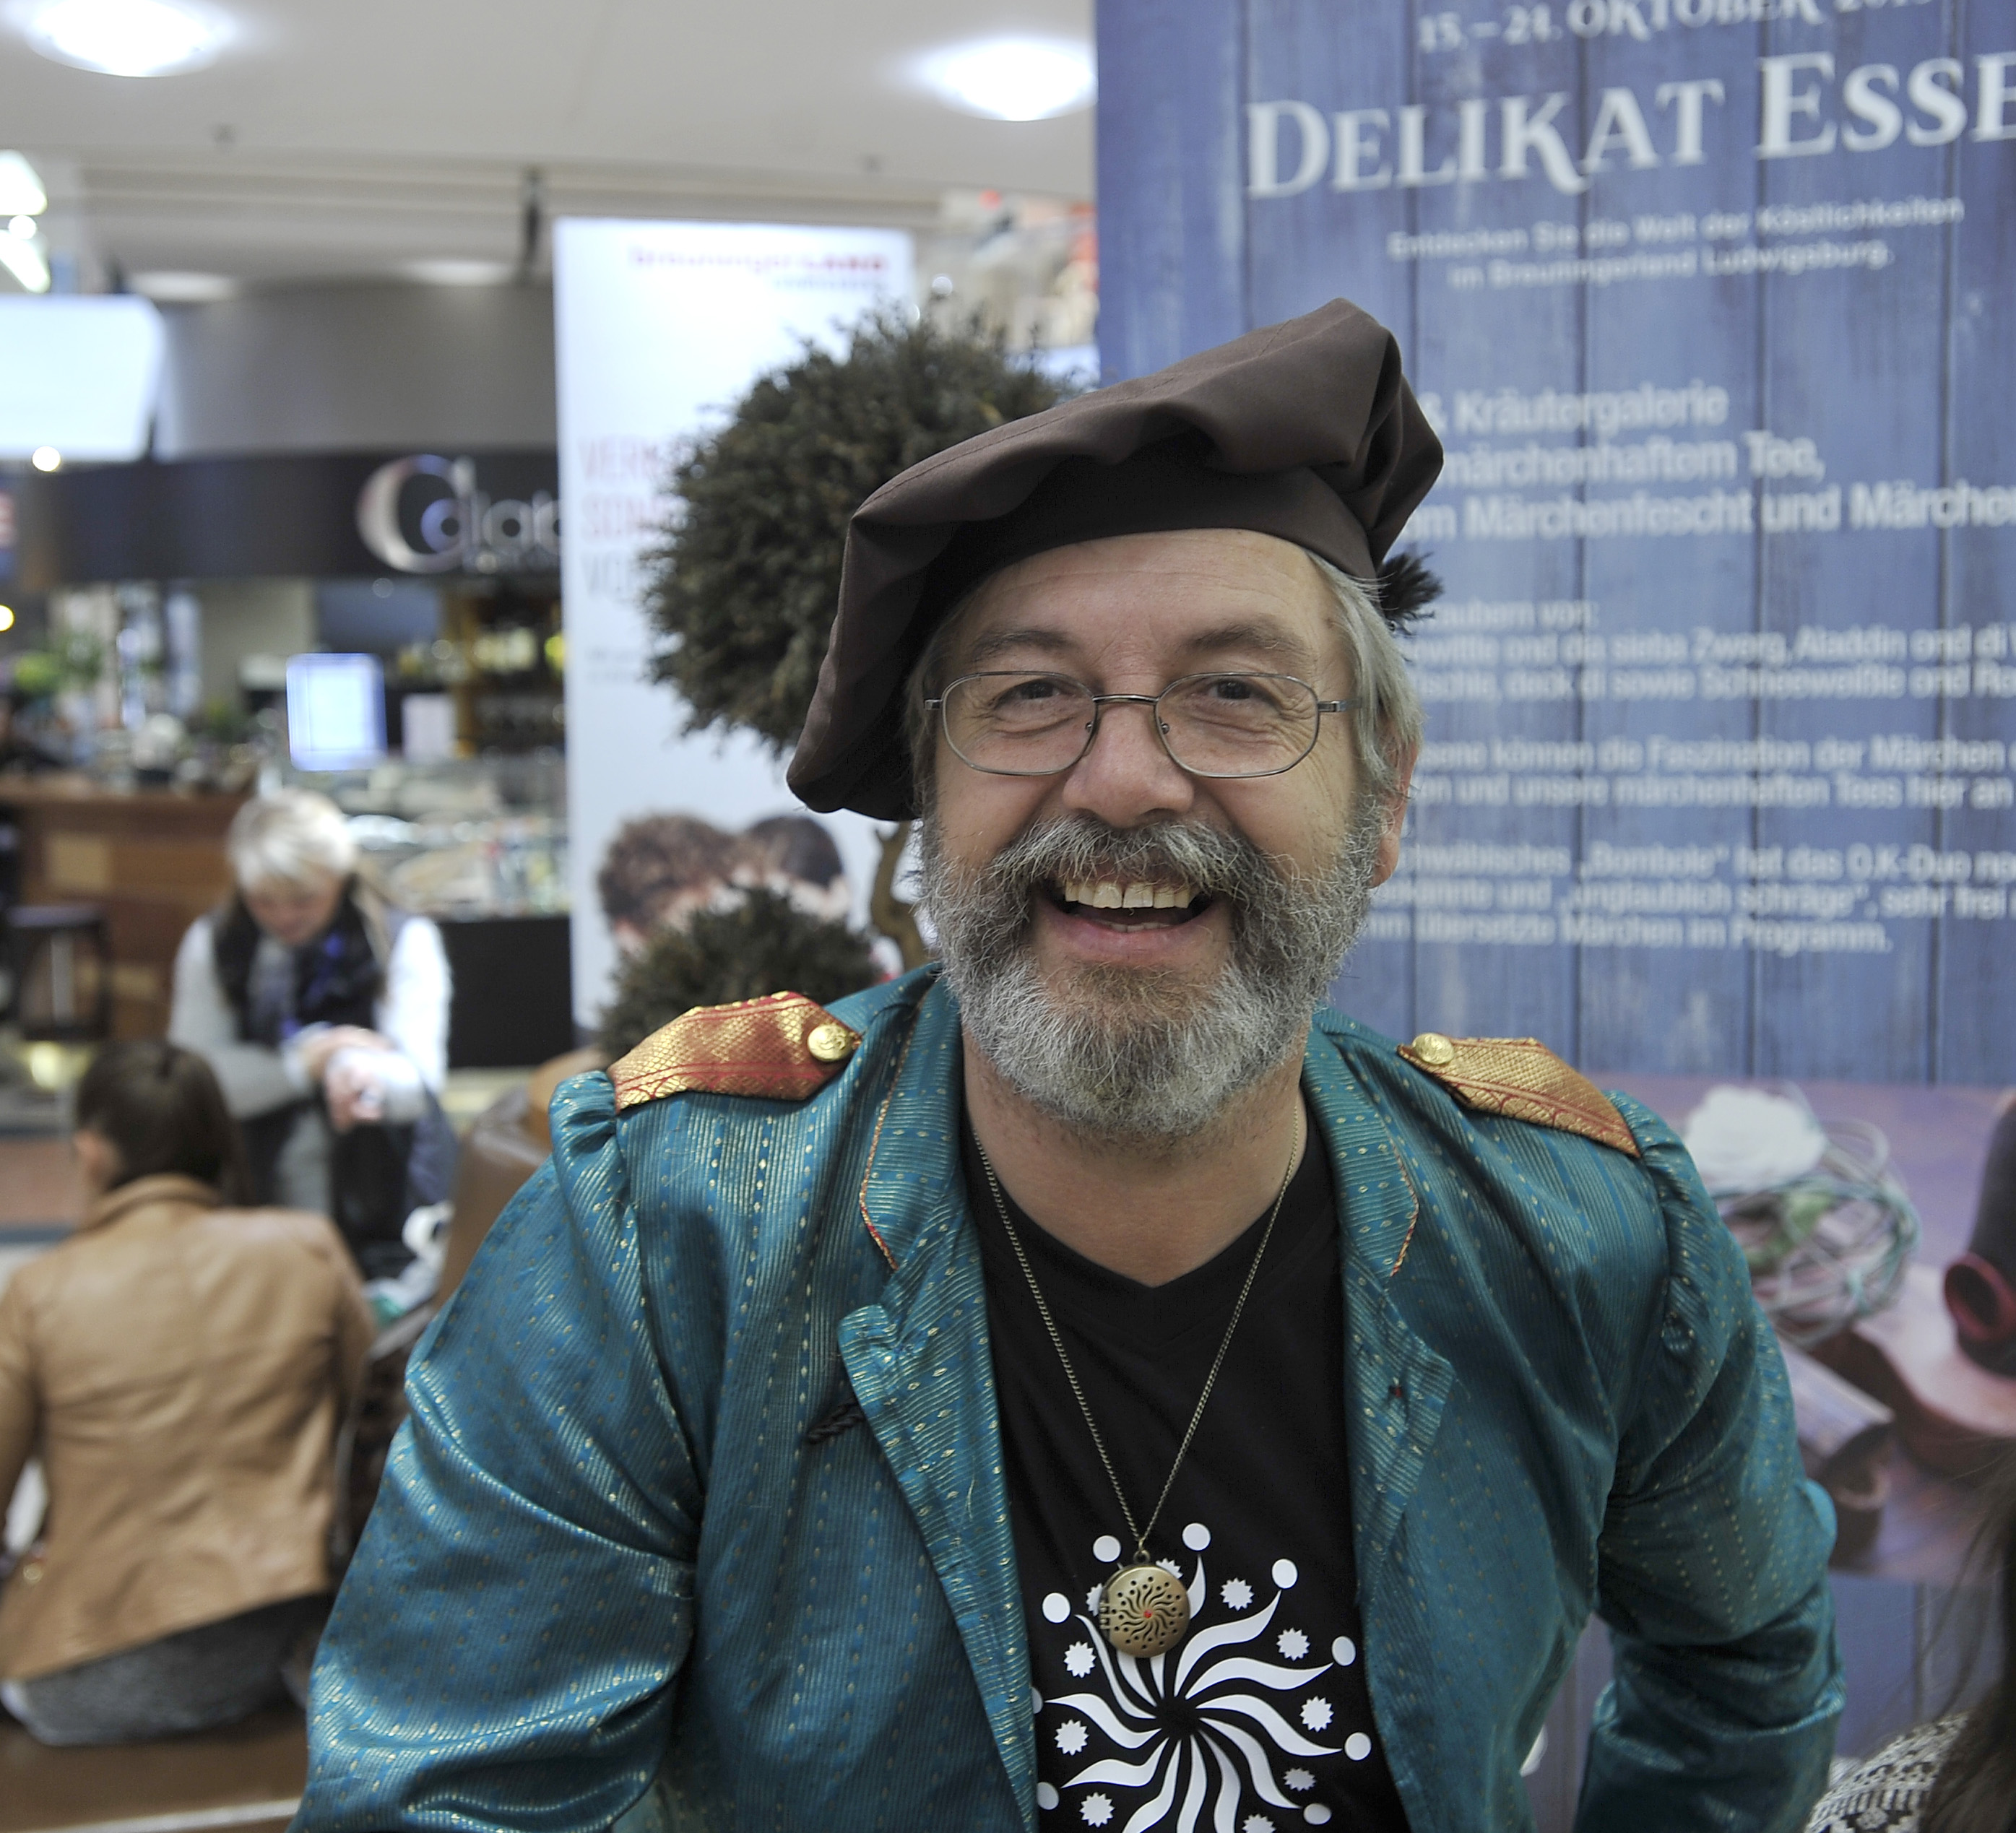 Breuningerland Ludwigsburg Delikat Essen 201515.10.15 -1